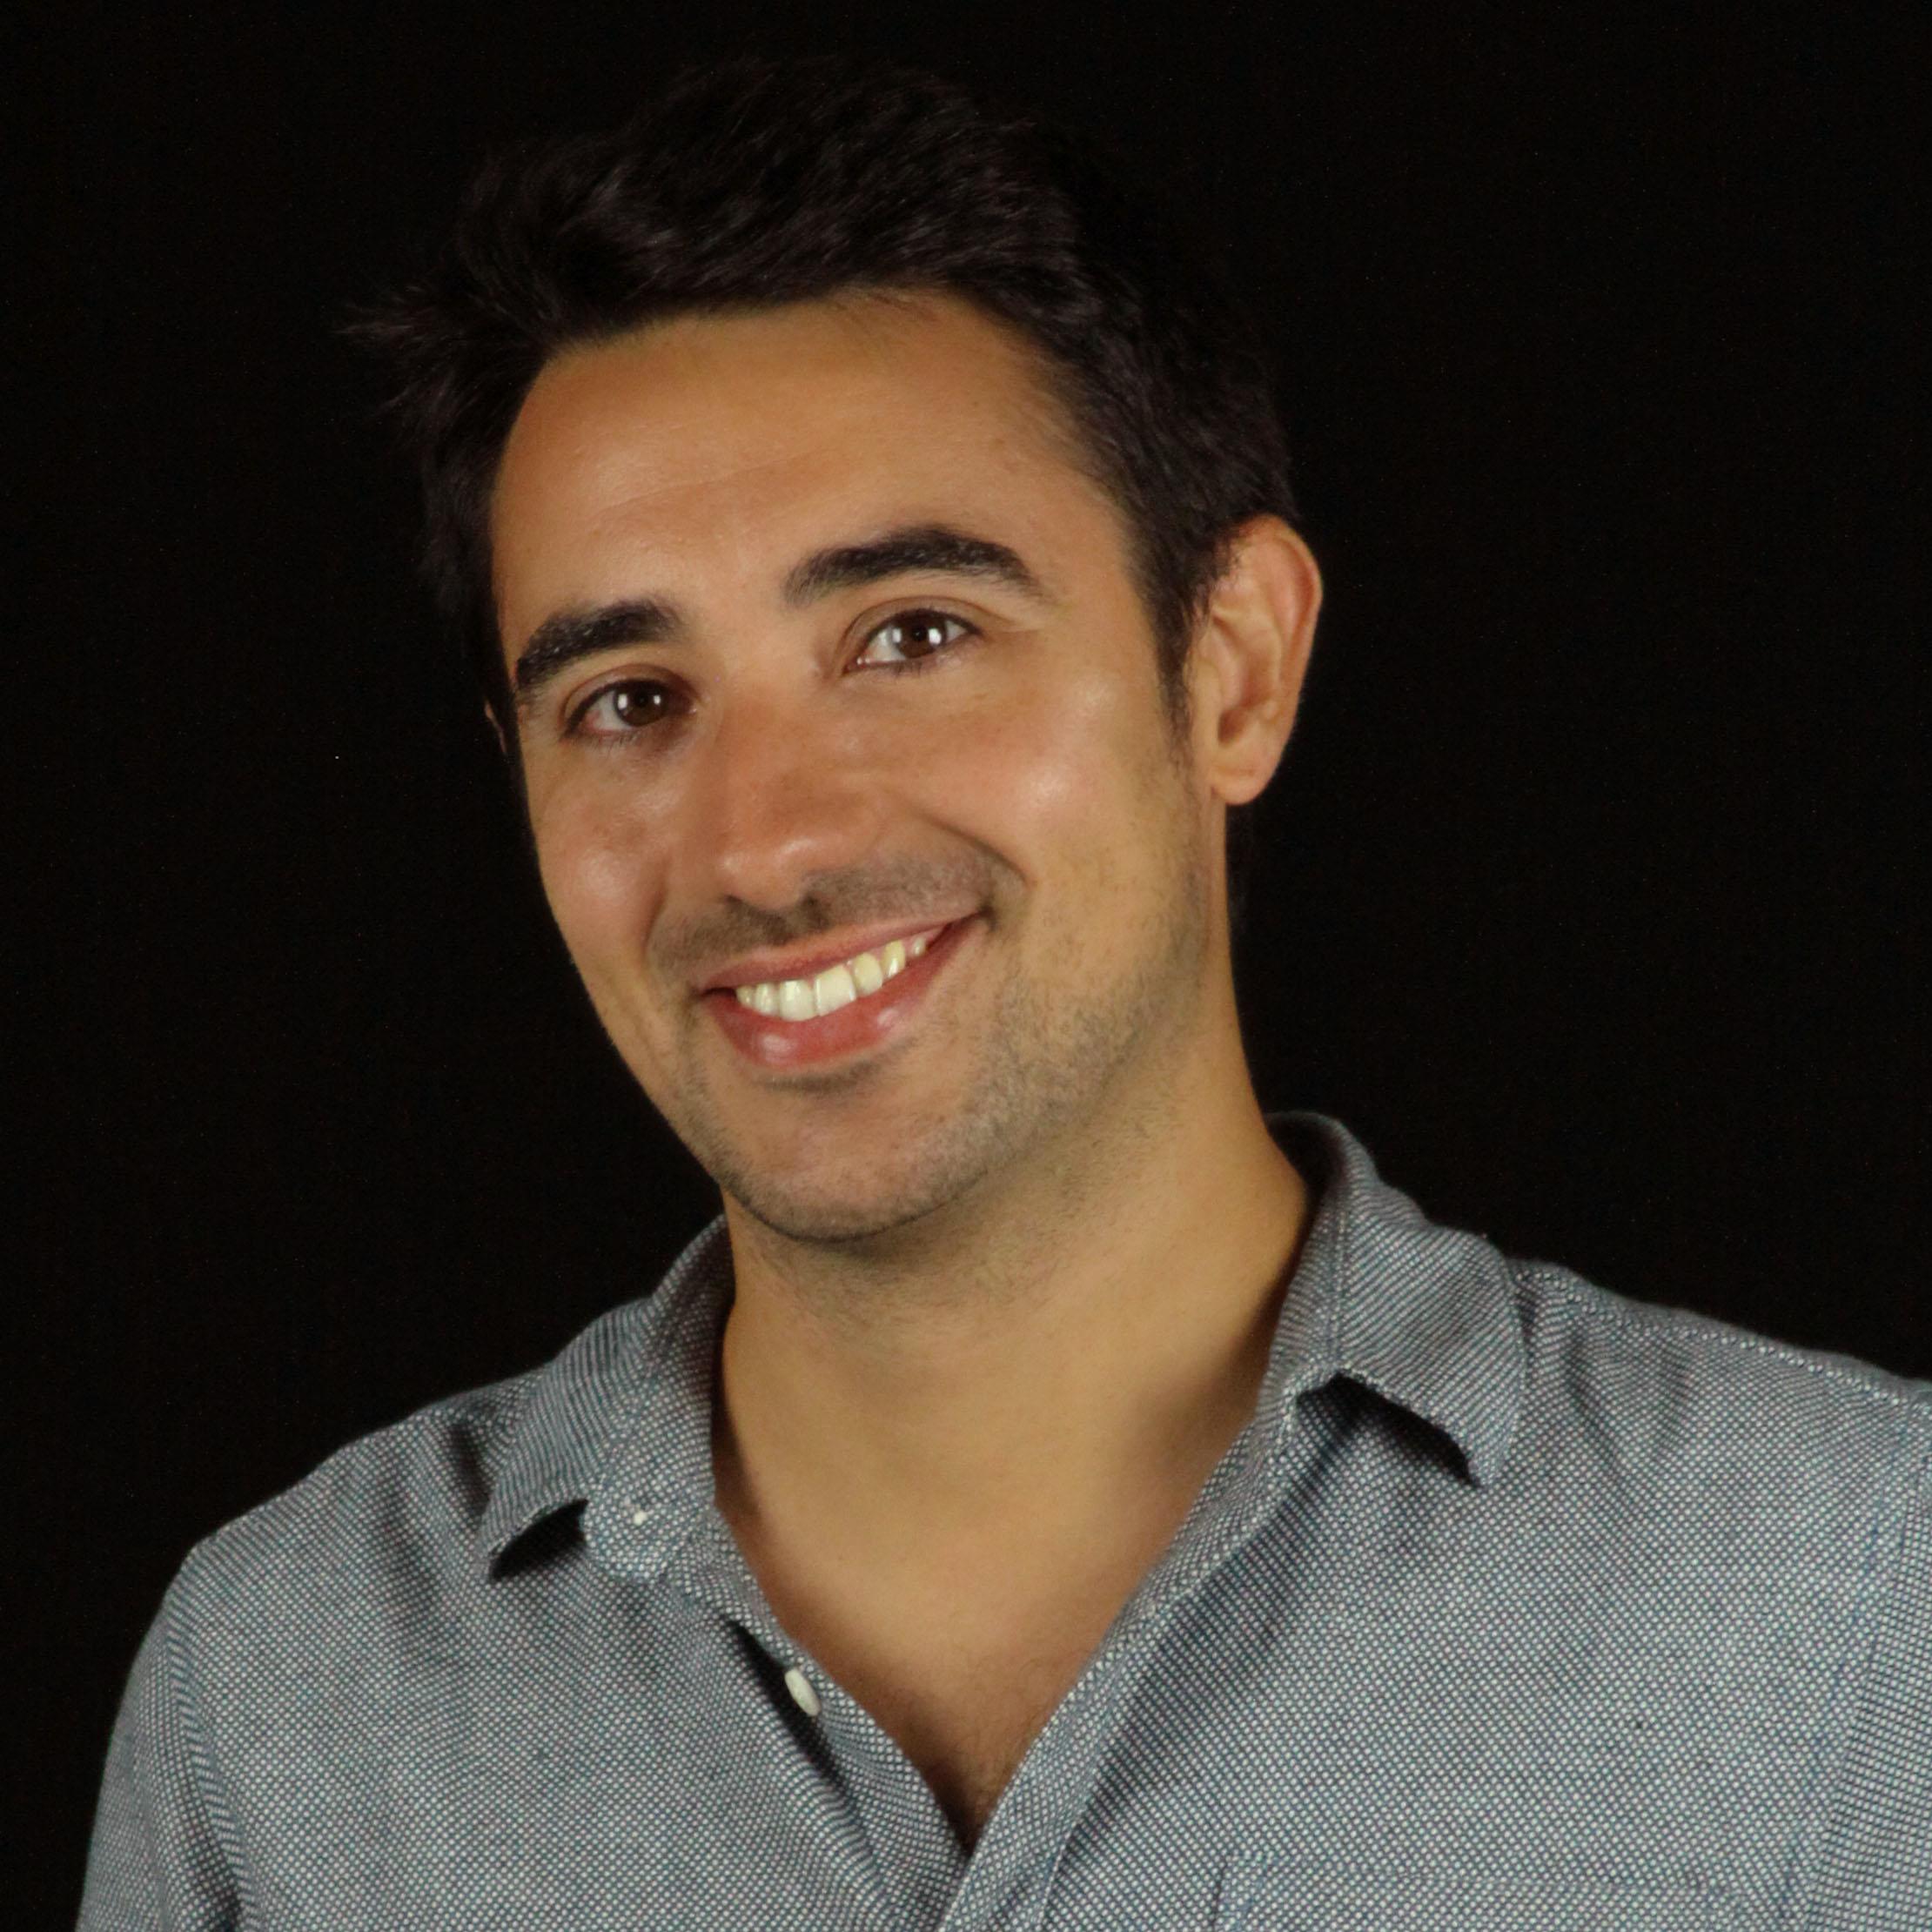 Marco Godinho